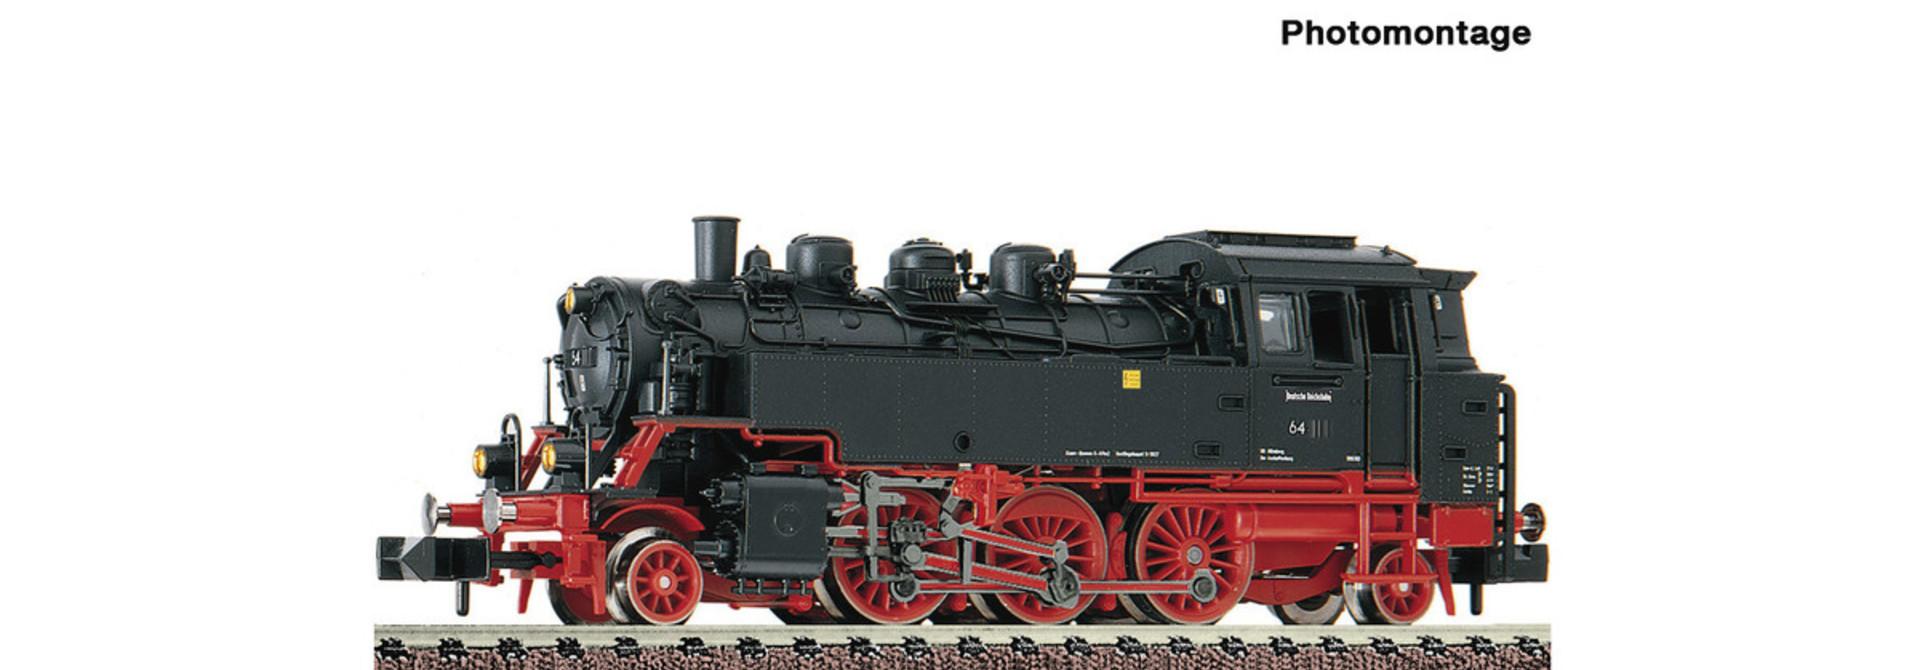 706183 Dampflok BR 64 DR DCC